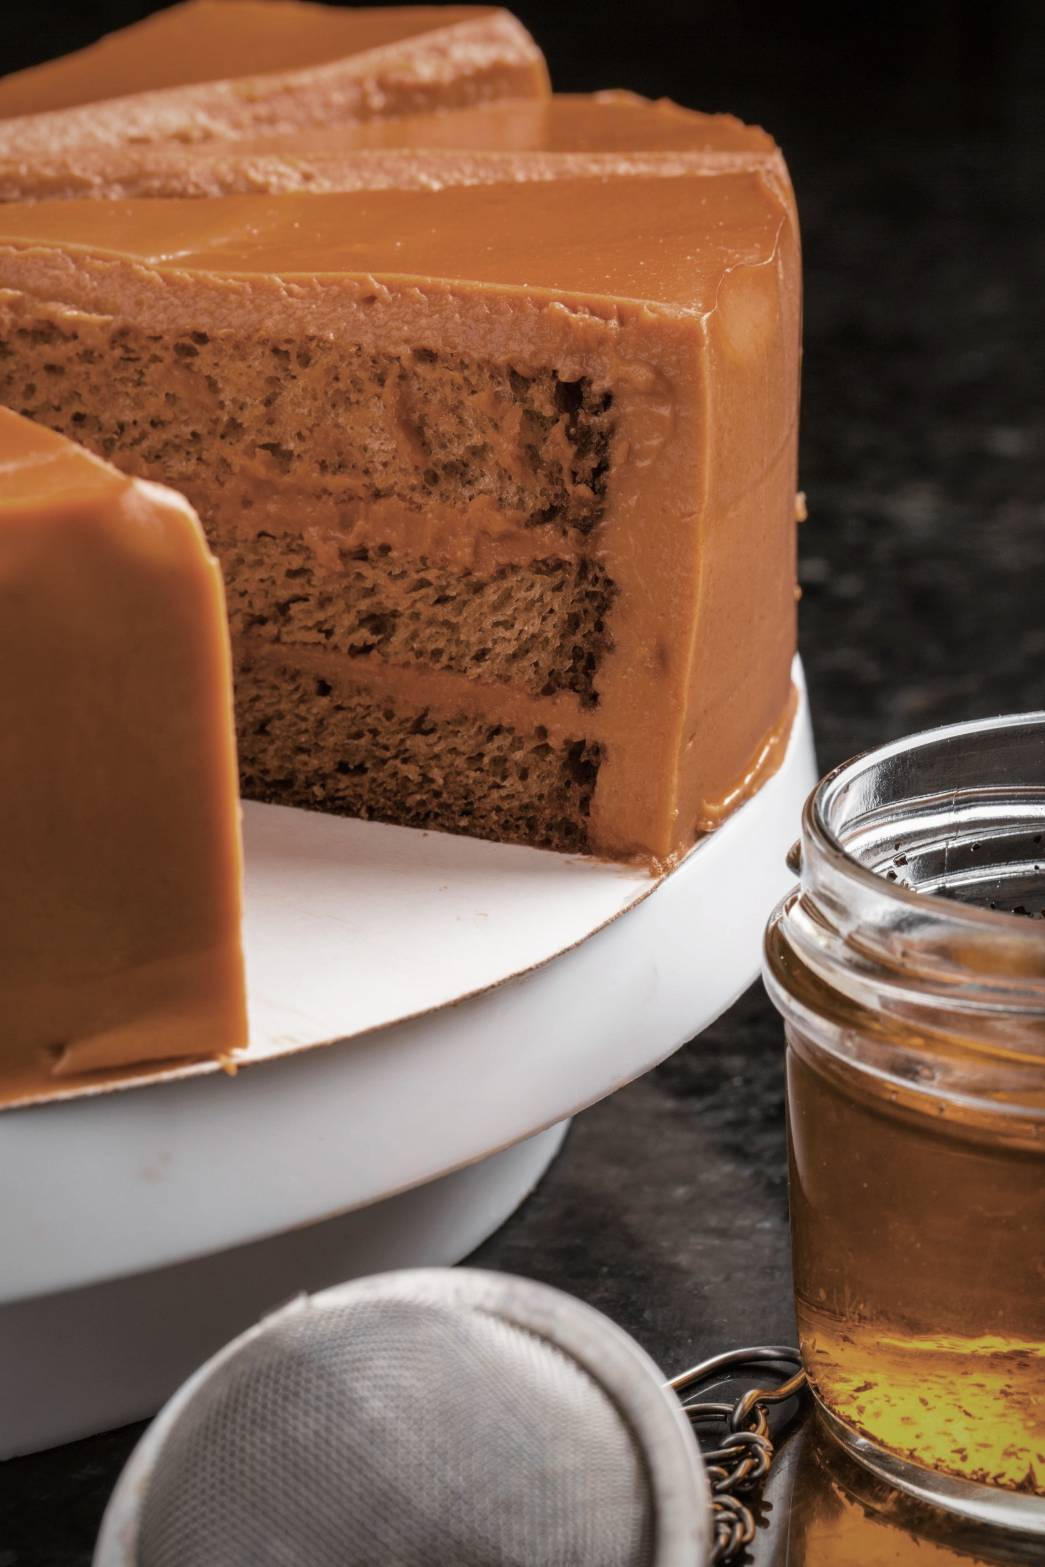 CHATHAISOFT CAKE - What we call CHA-THAI-NHAR-NIM